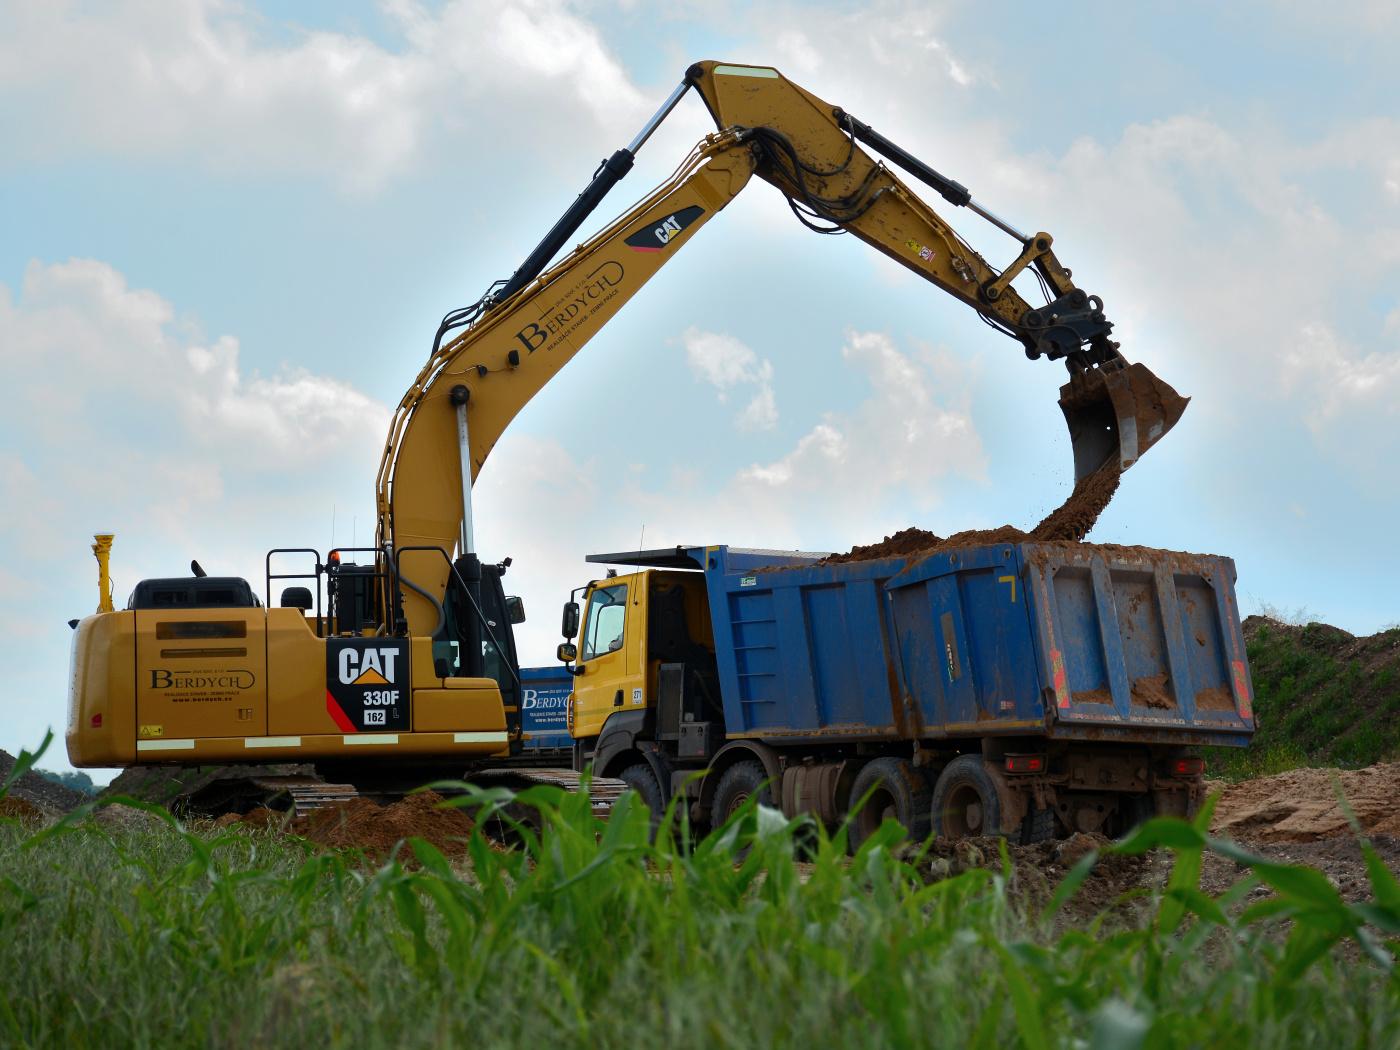 Na jih rychleji, začala stavba obchvatu Olbramovic, hotovo bude v roce 2023